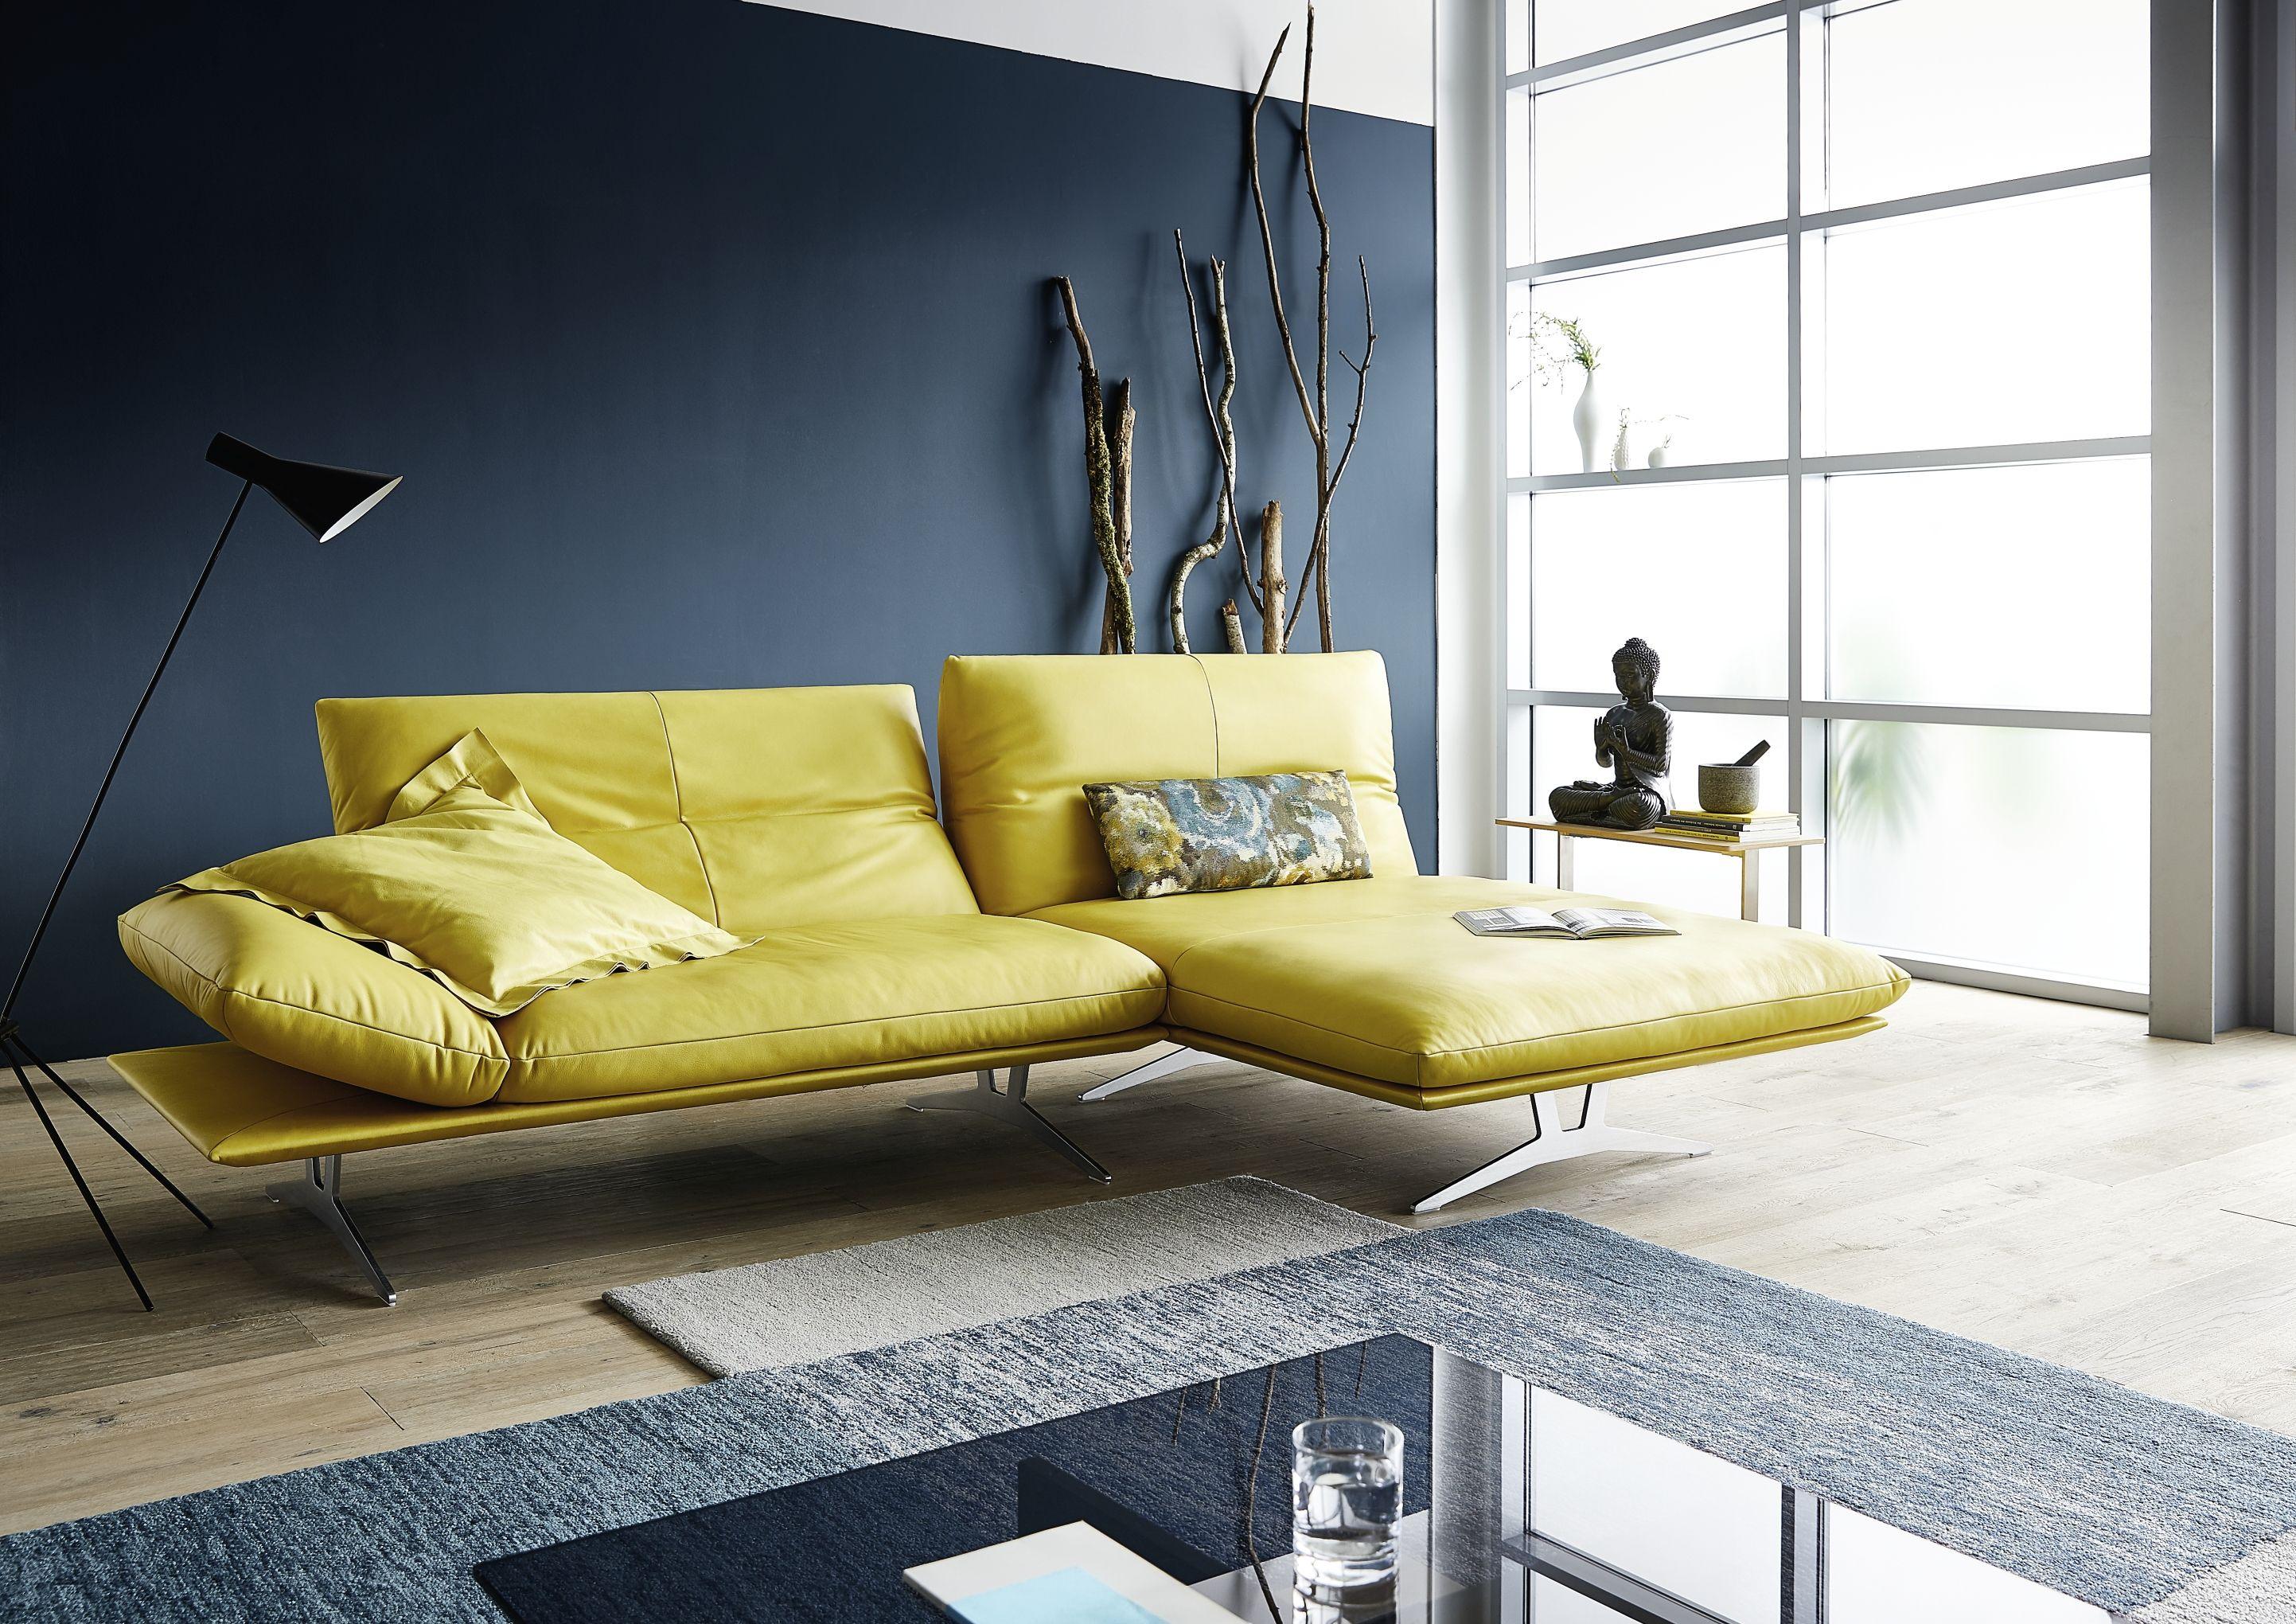 Koinor Ledersofa Francis Gelb Sofa Gelb Wohnzimmer Dekor Modern Sofa Design